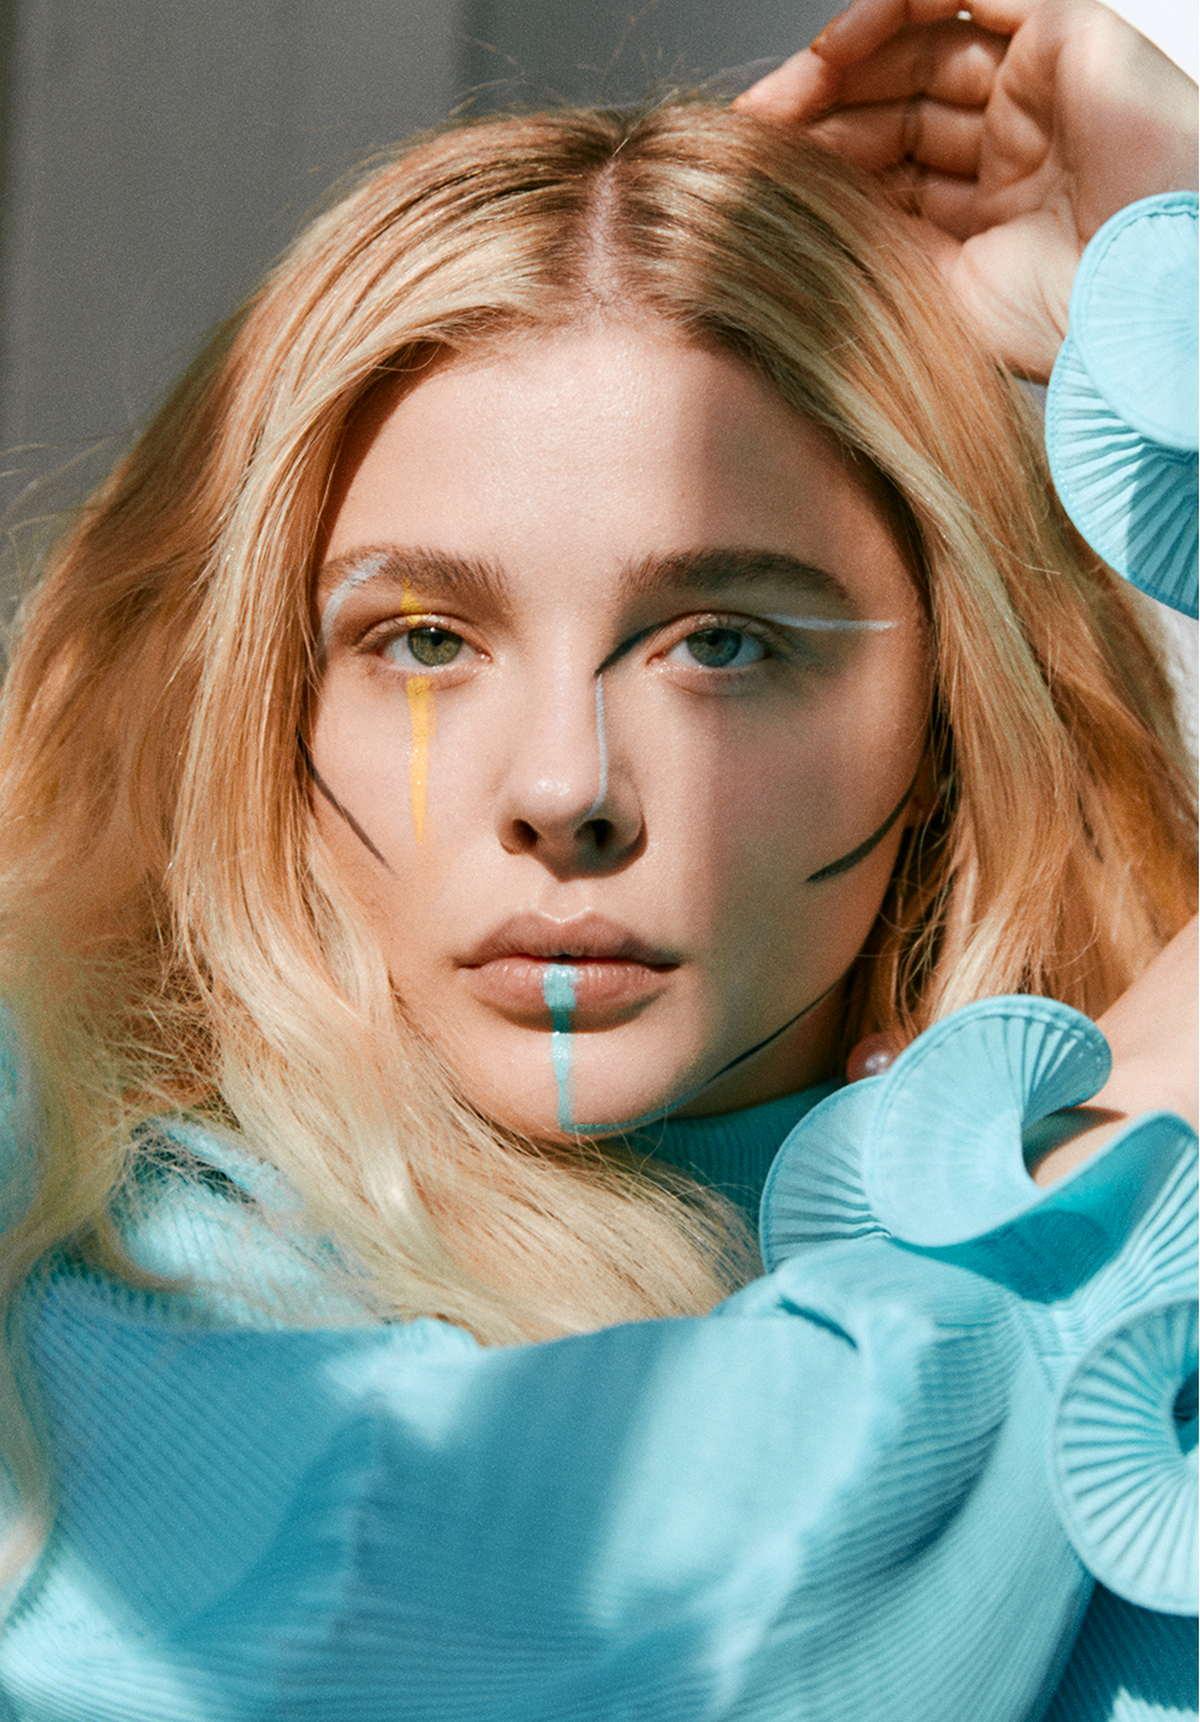 Chloë-Grace-Moretz-Photographed-by-Harper-Smith-for-Who-Wat-Wear-201800001.jpg